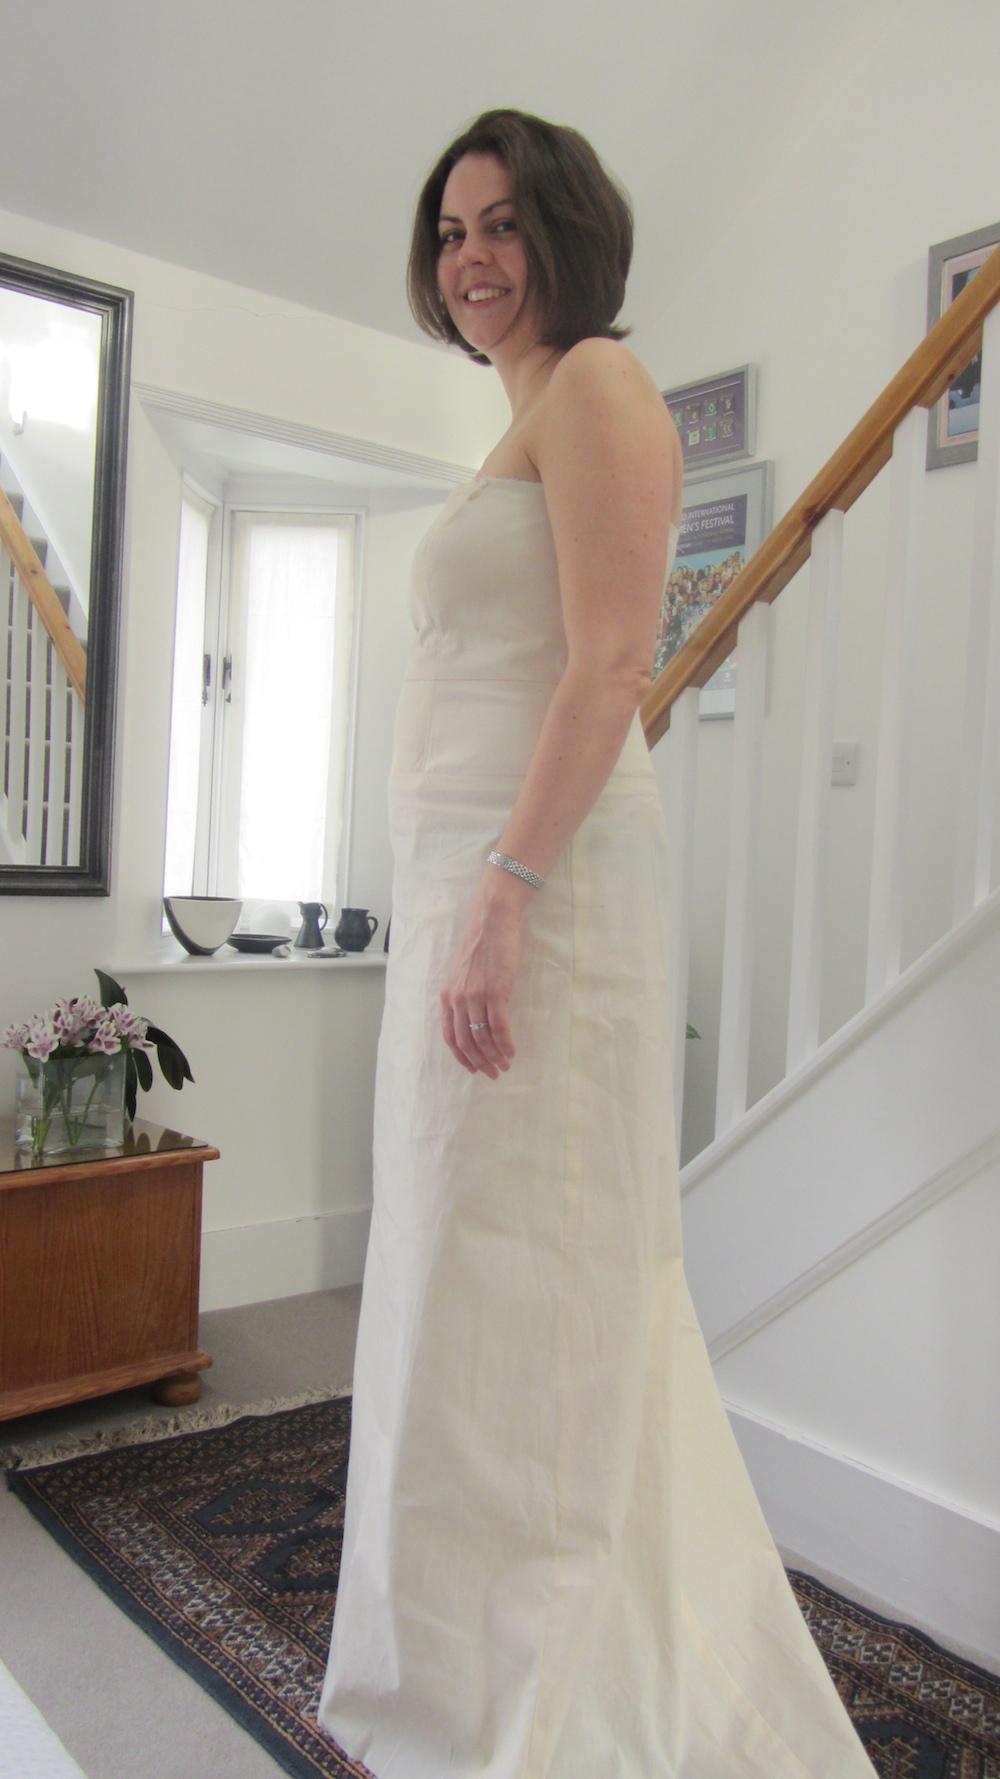 Handmade wedding dress toile.jpg